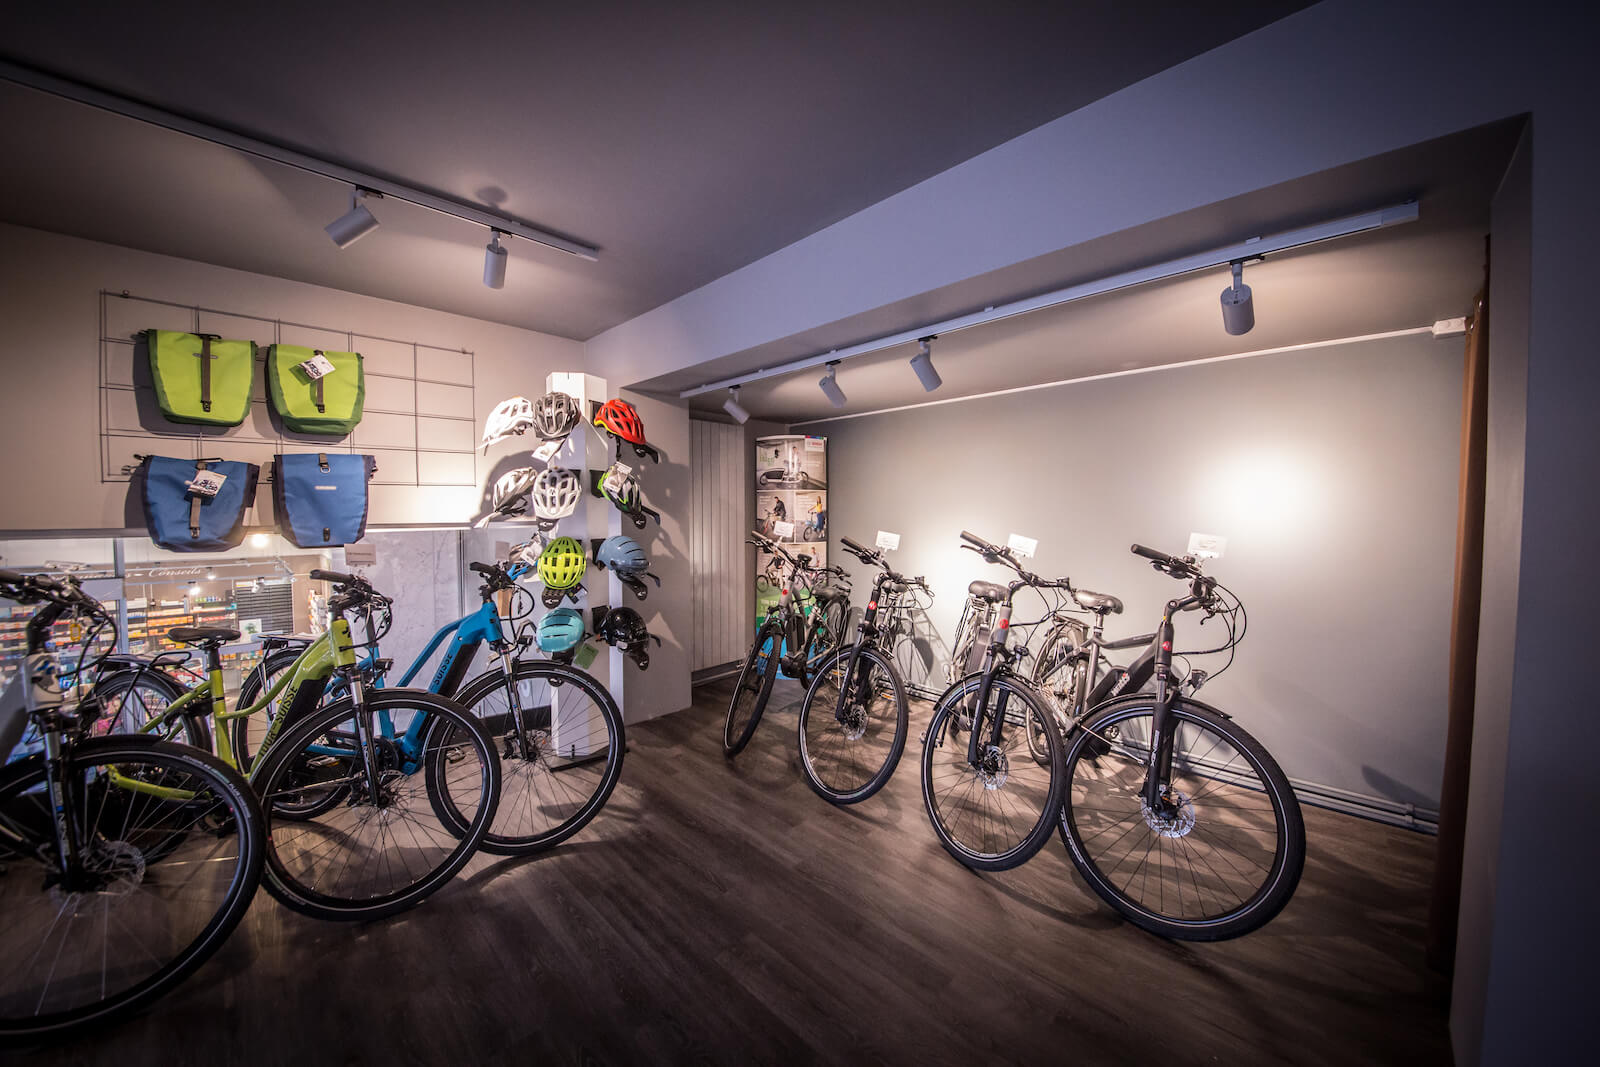 Premier étage du magasin Charly's Bike Store à Genève